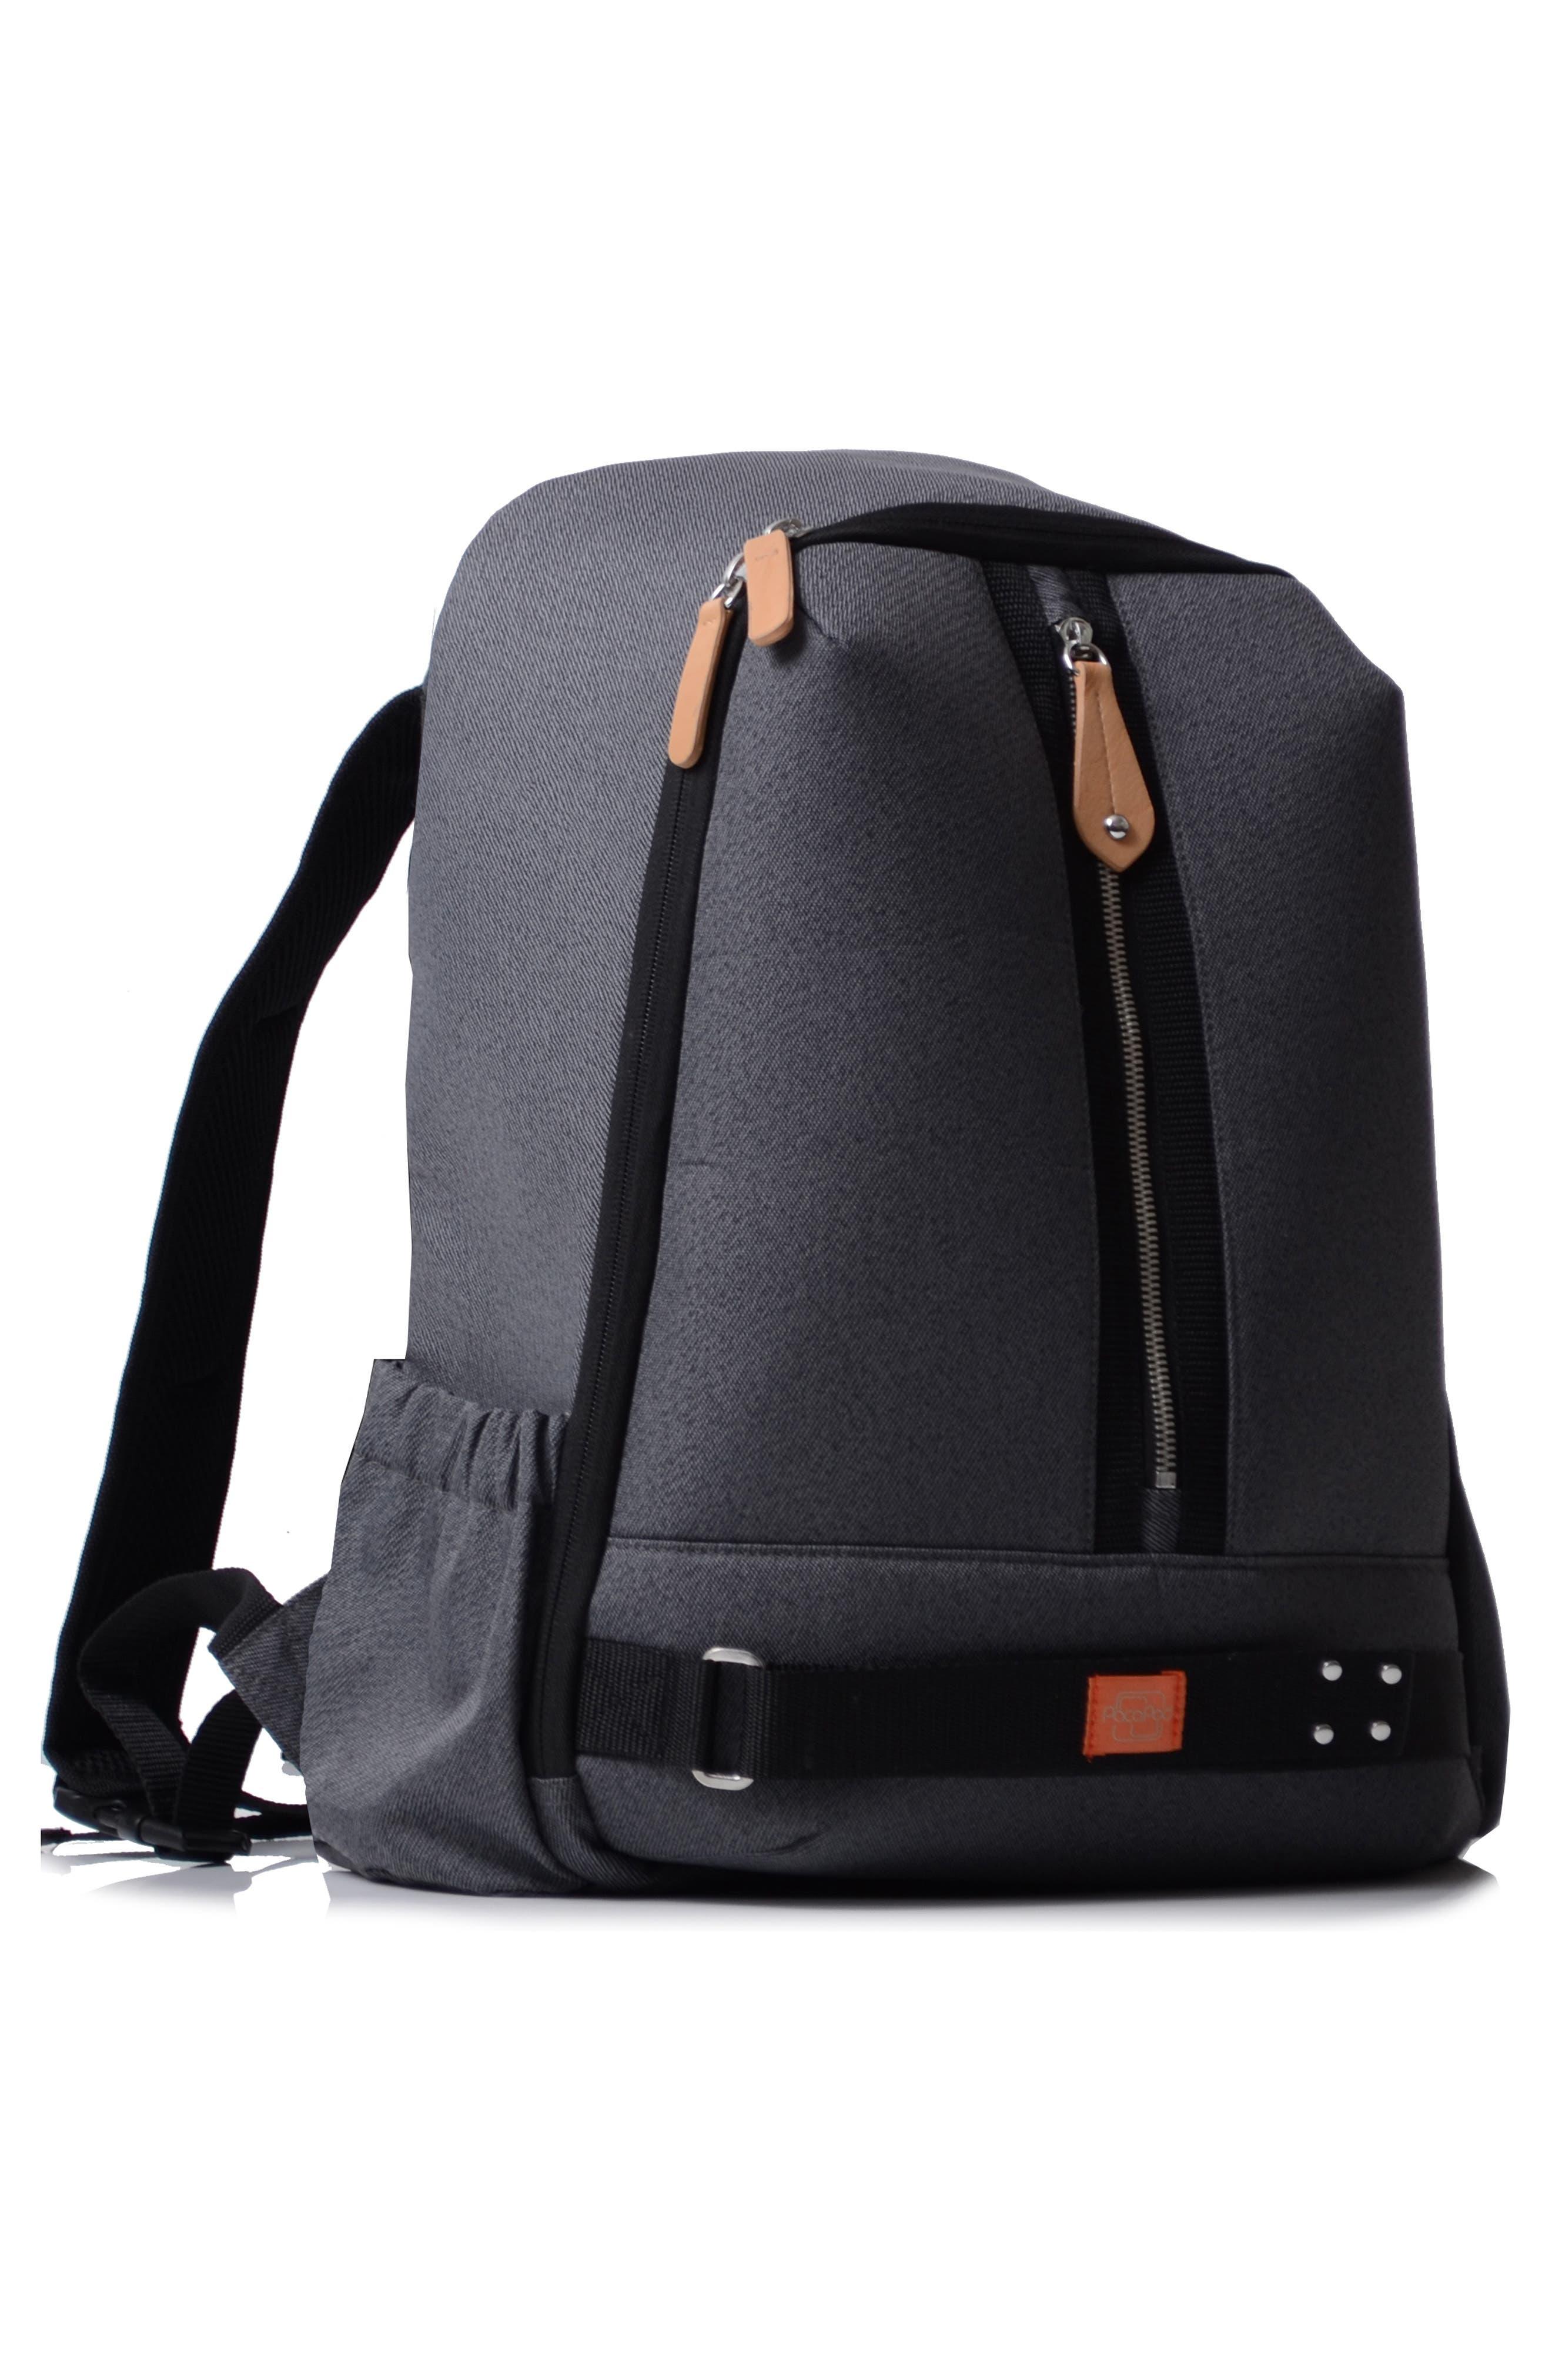 Picos Pack Diaper Backpack,                             Alternate thumbnail 3, color,                             BLACK CHARCOAL